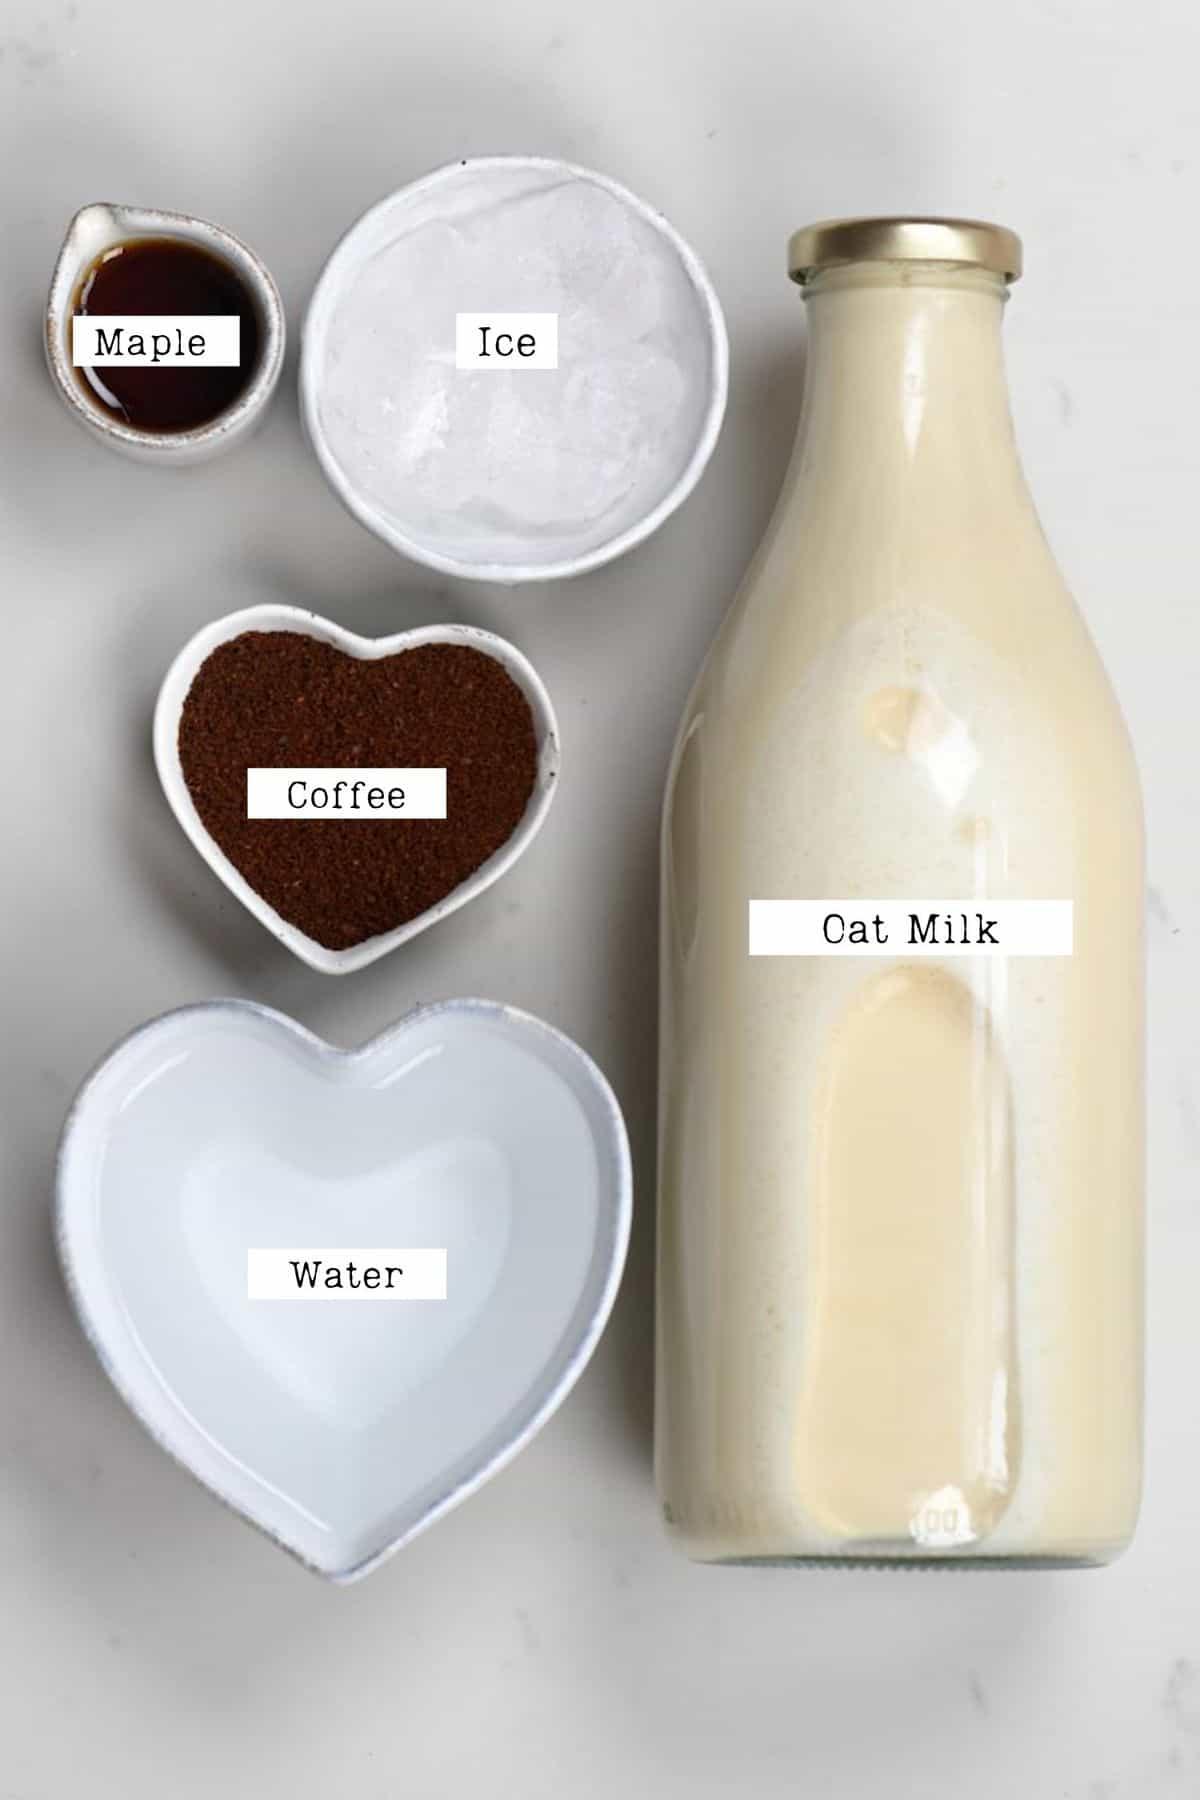 Iced Latte ingredients